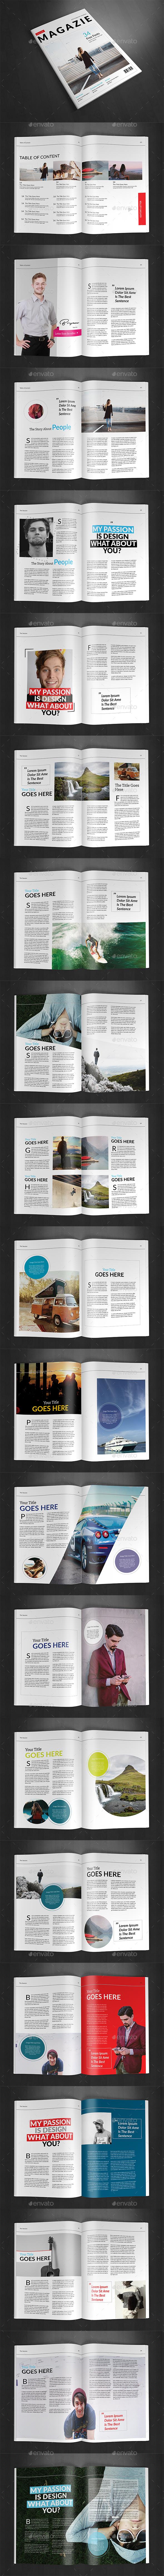 A4 Magazine Template Vol.21